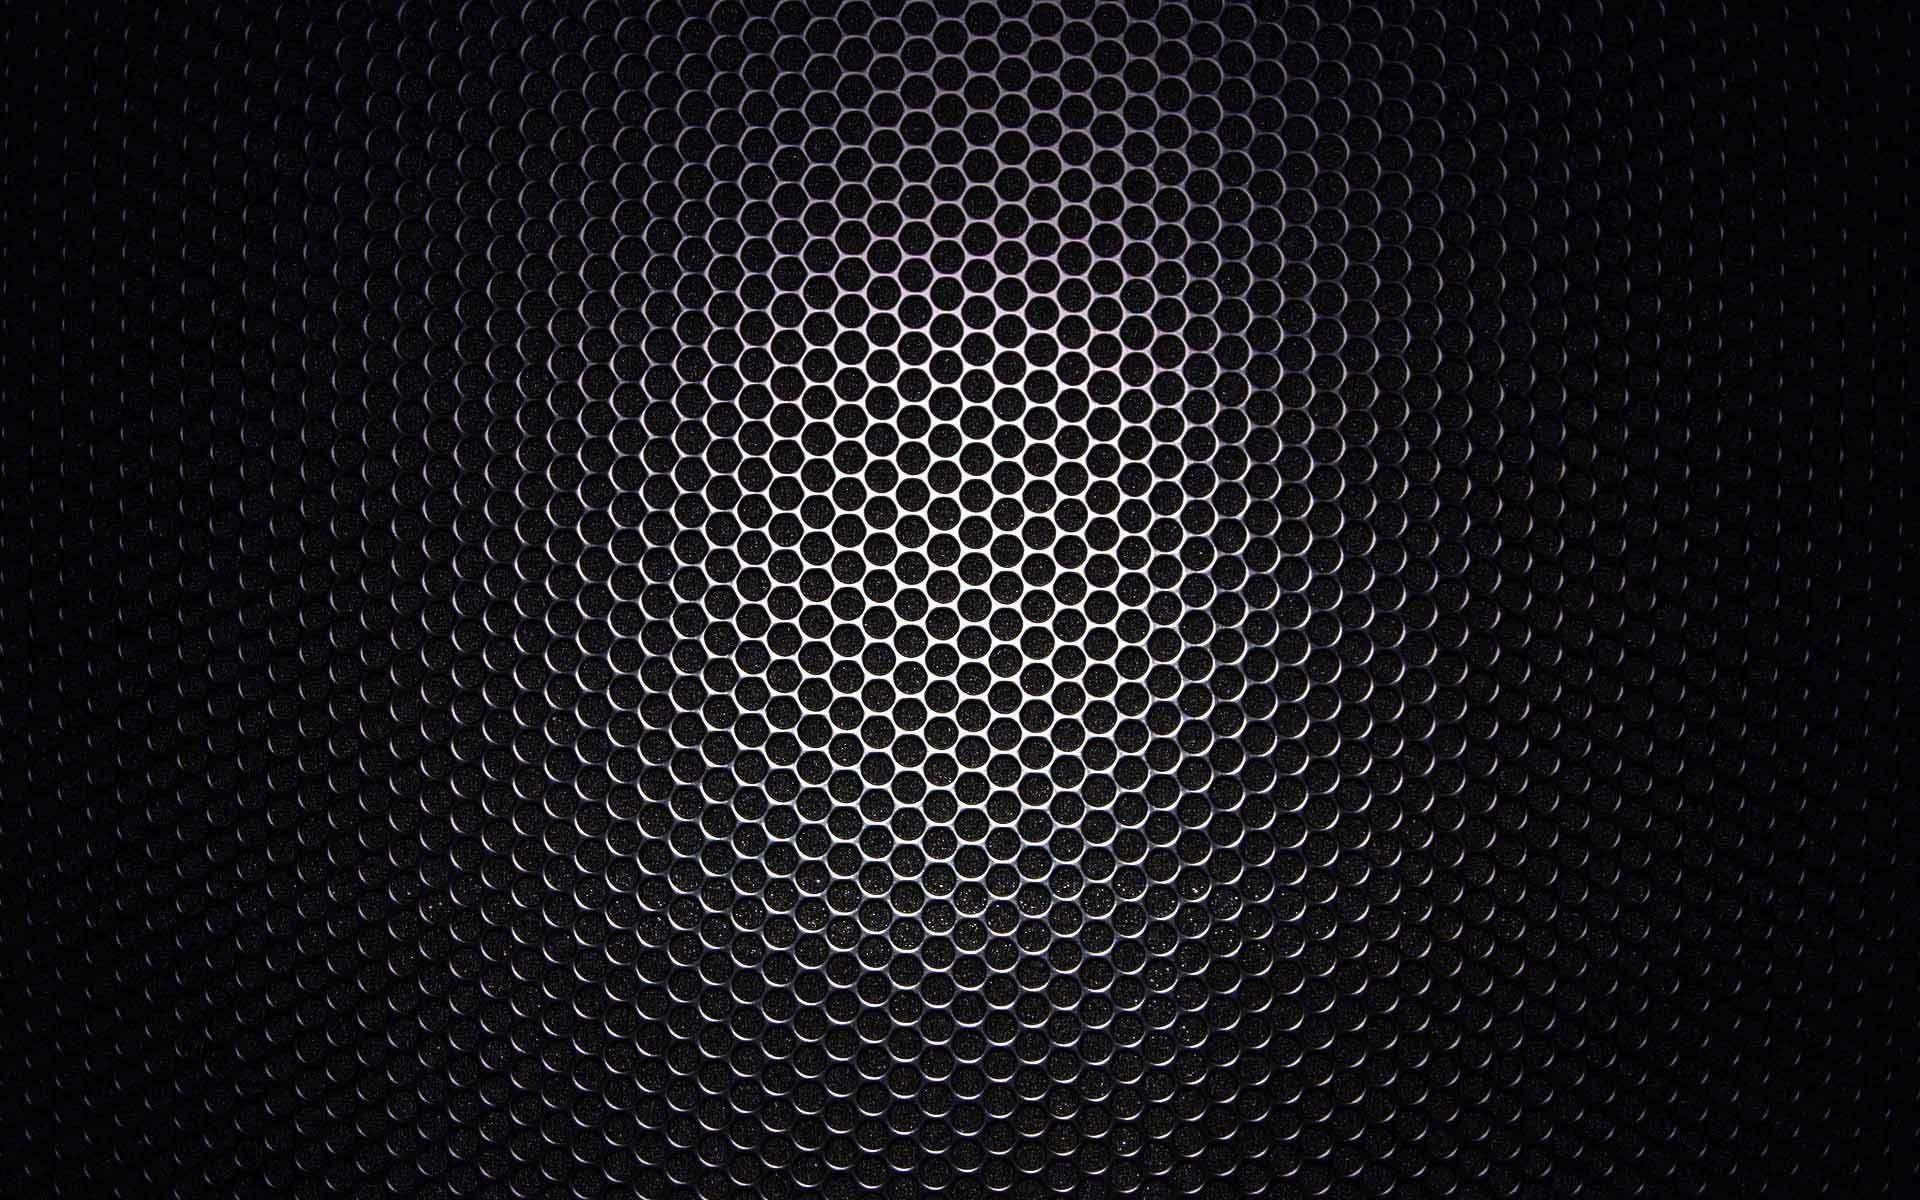 Cool Deep Meaning Iphone 6 Cute Black Wallpaper Wallpaper Theme Walls